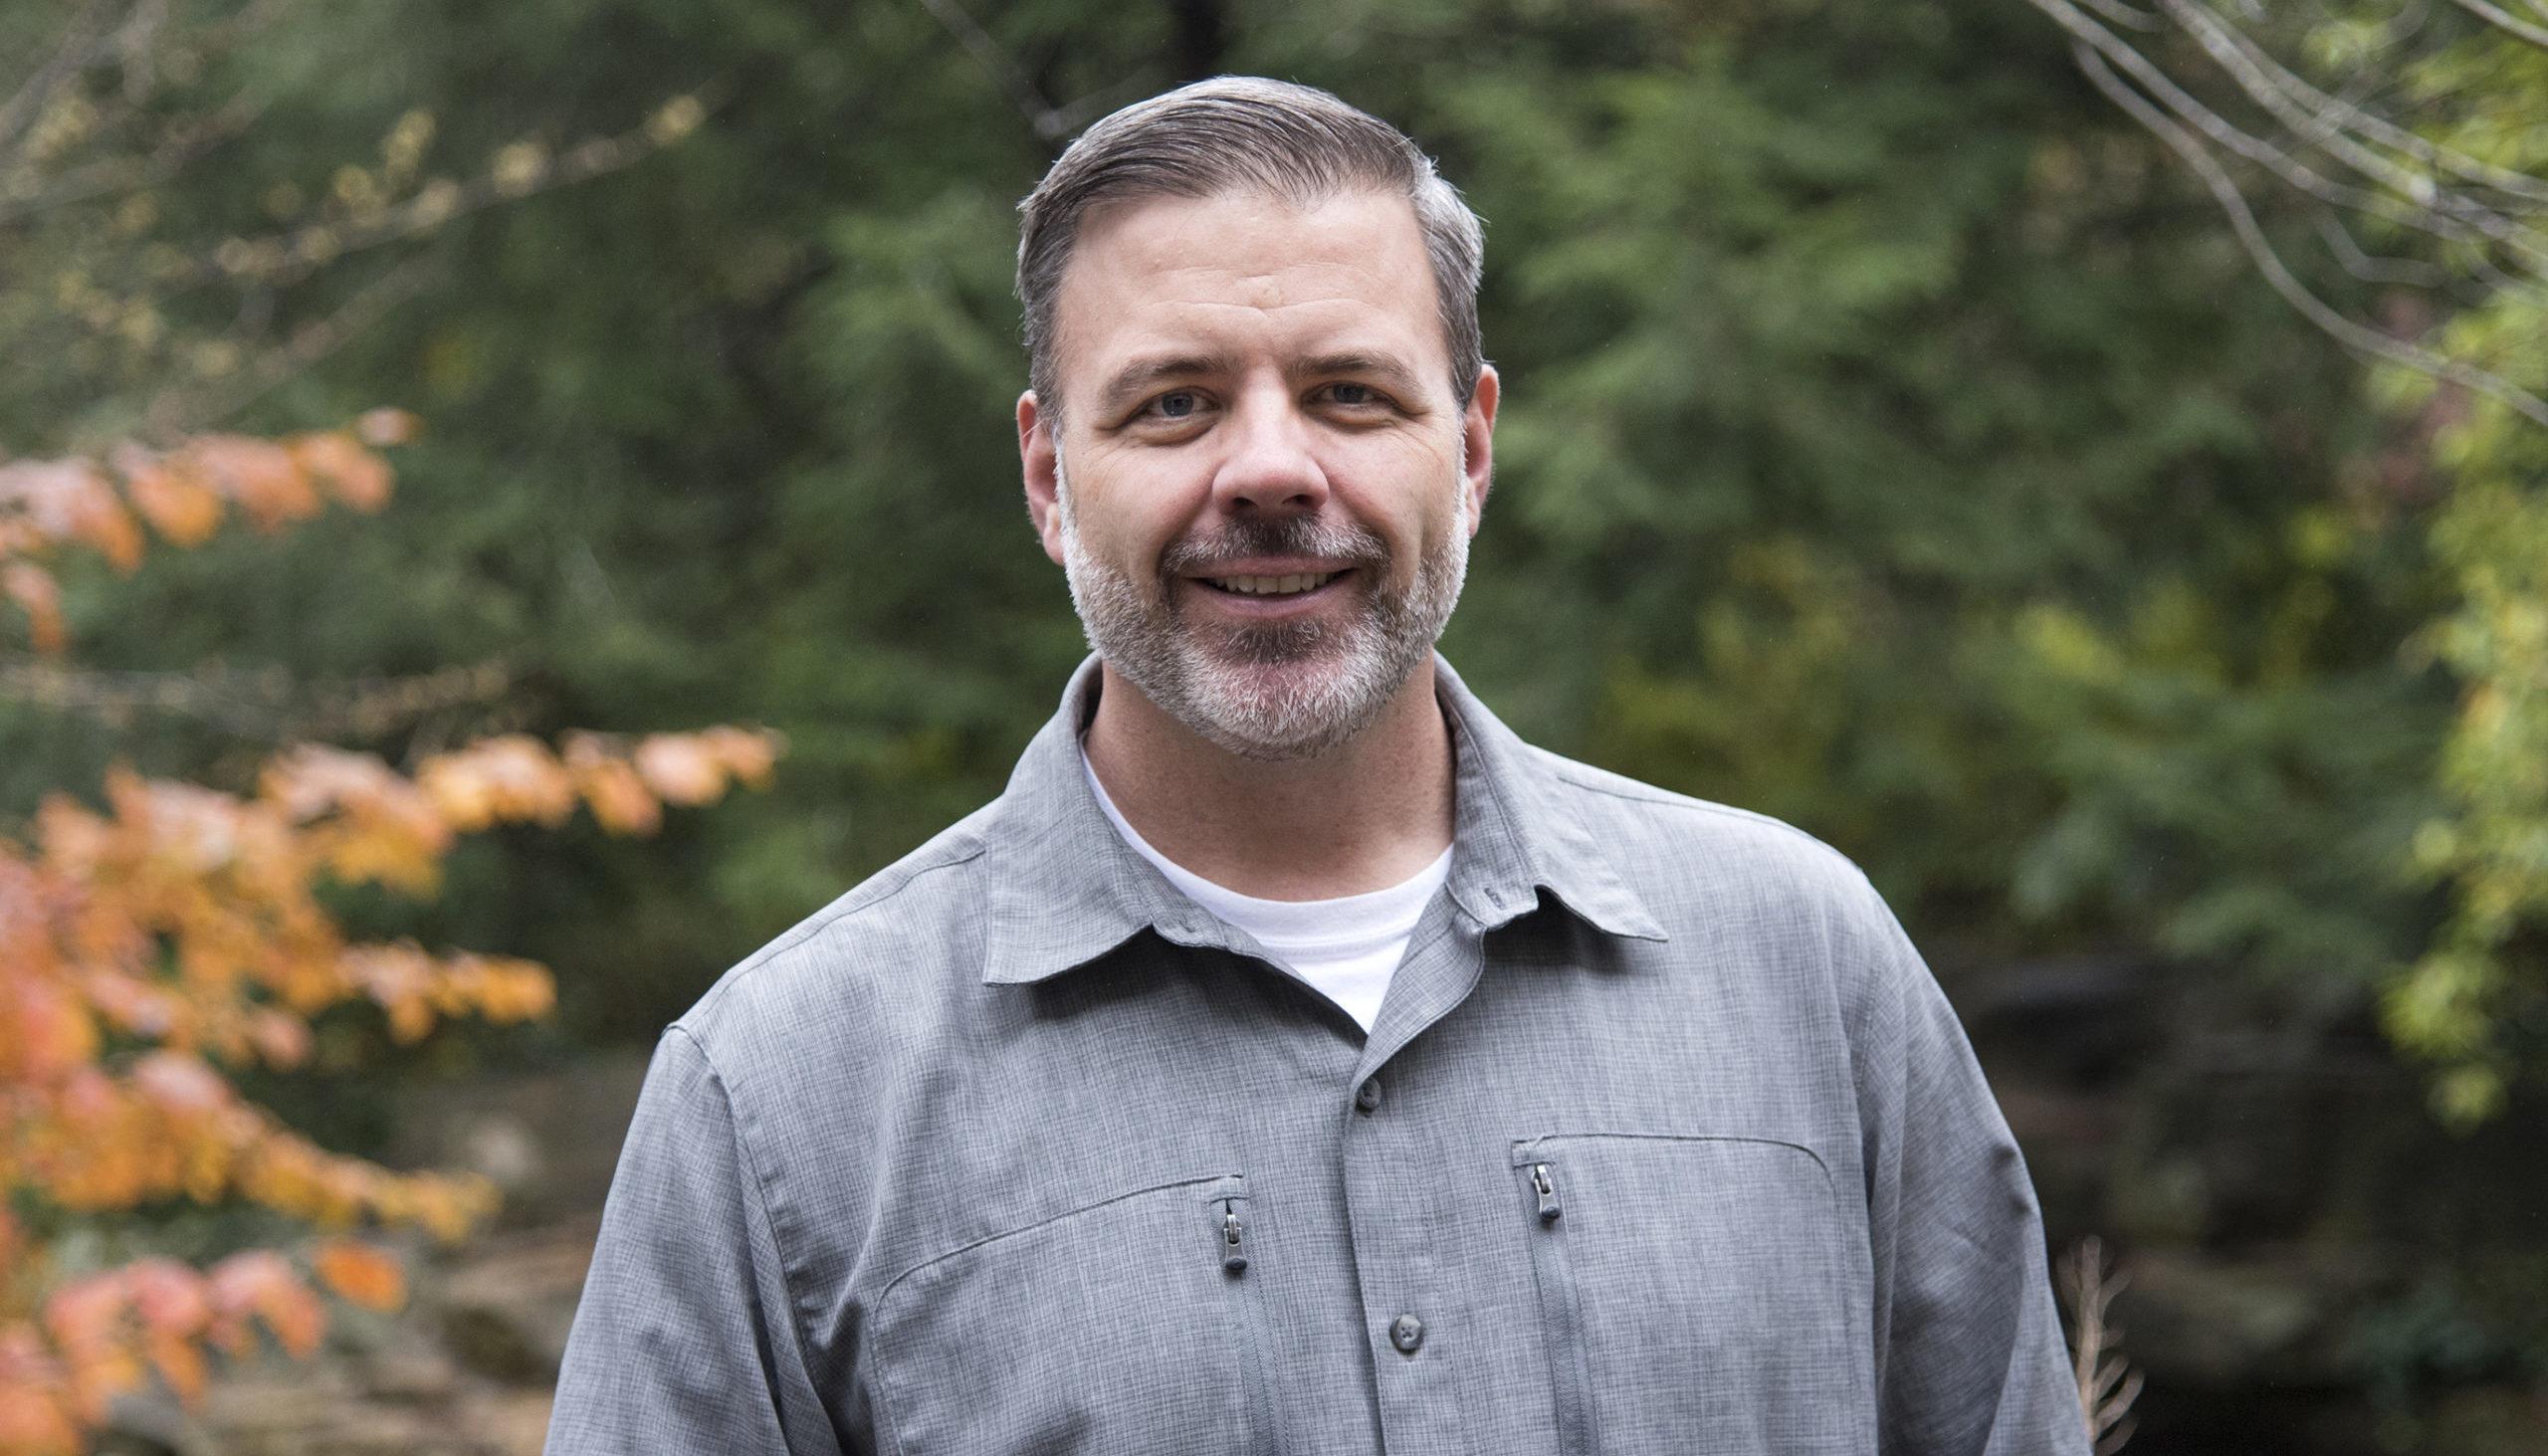 Undergraduate Coordinator Andrew Pulte